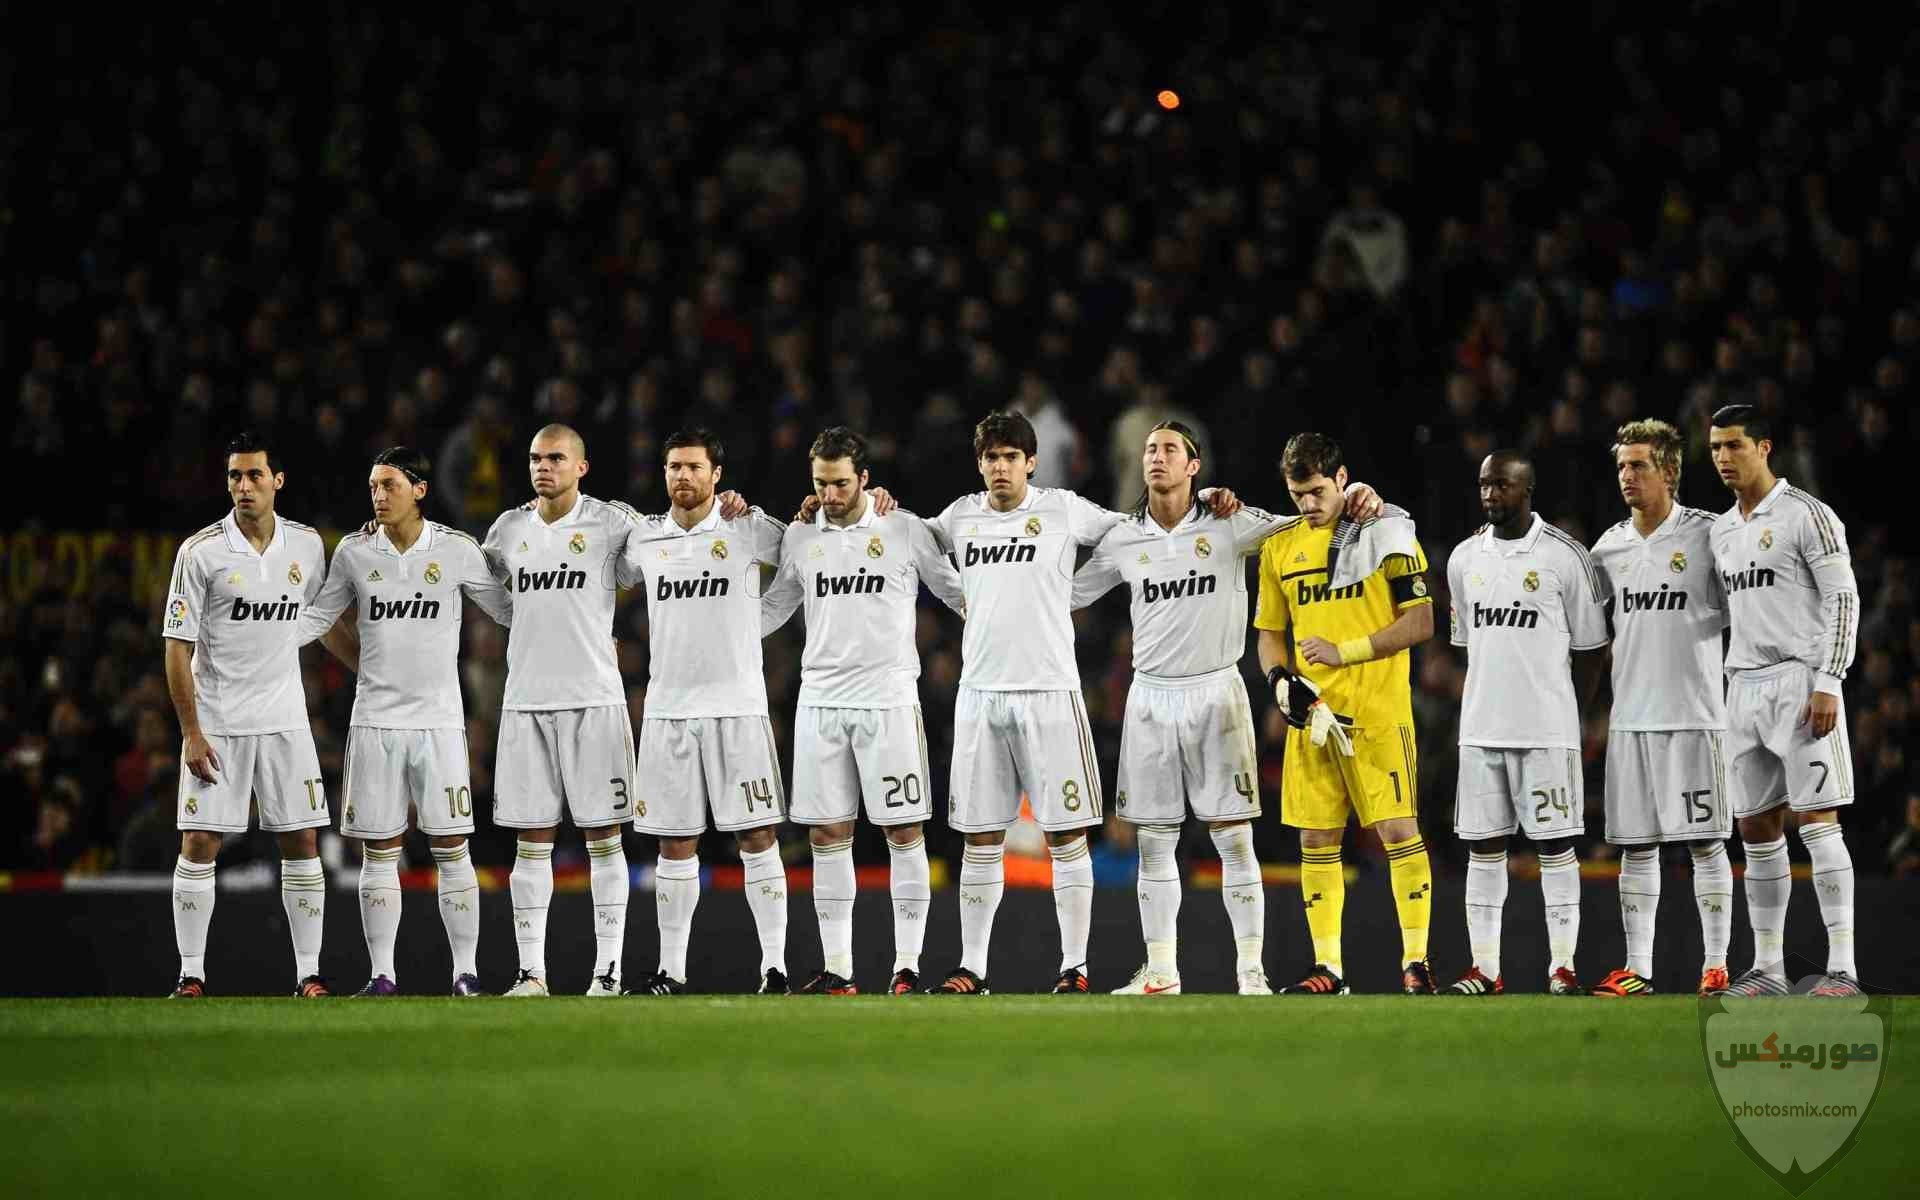 صور ريال مدريد 2020خلفيات ورمزيات ريال مدريد صور لاعبي ريال مدريد real madrid 42